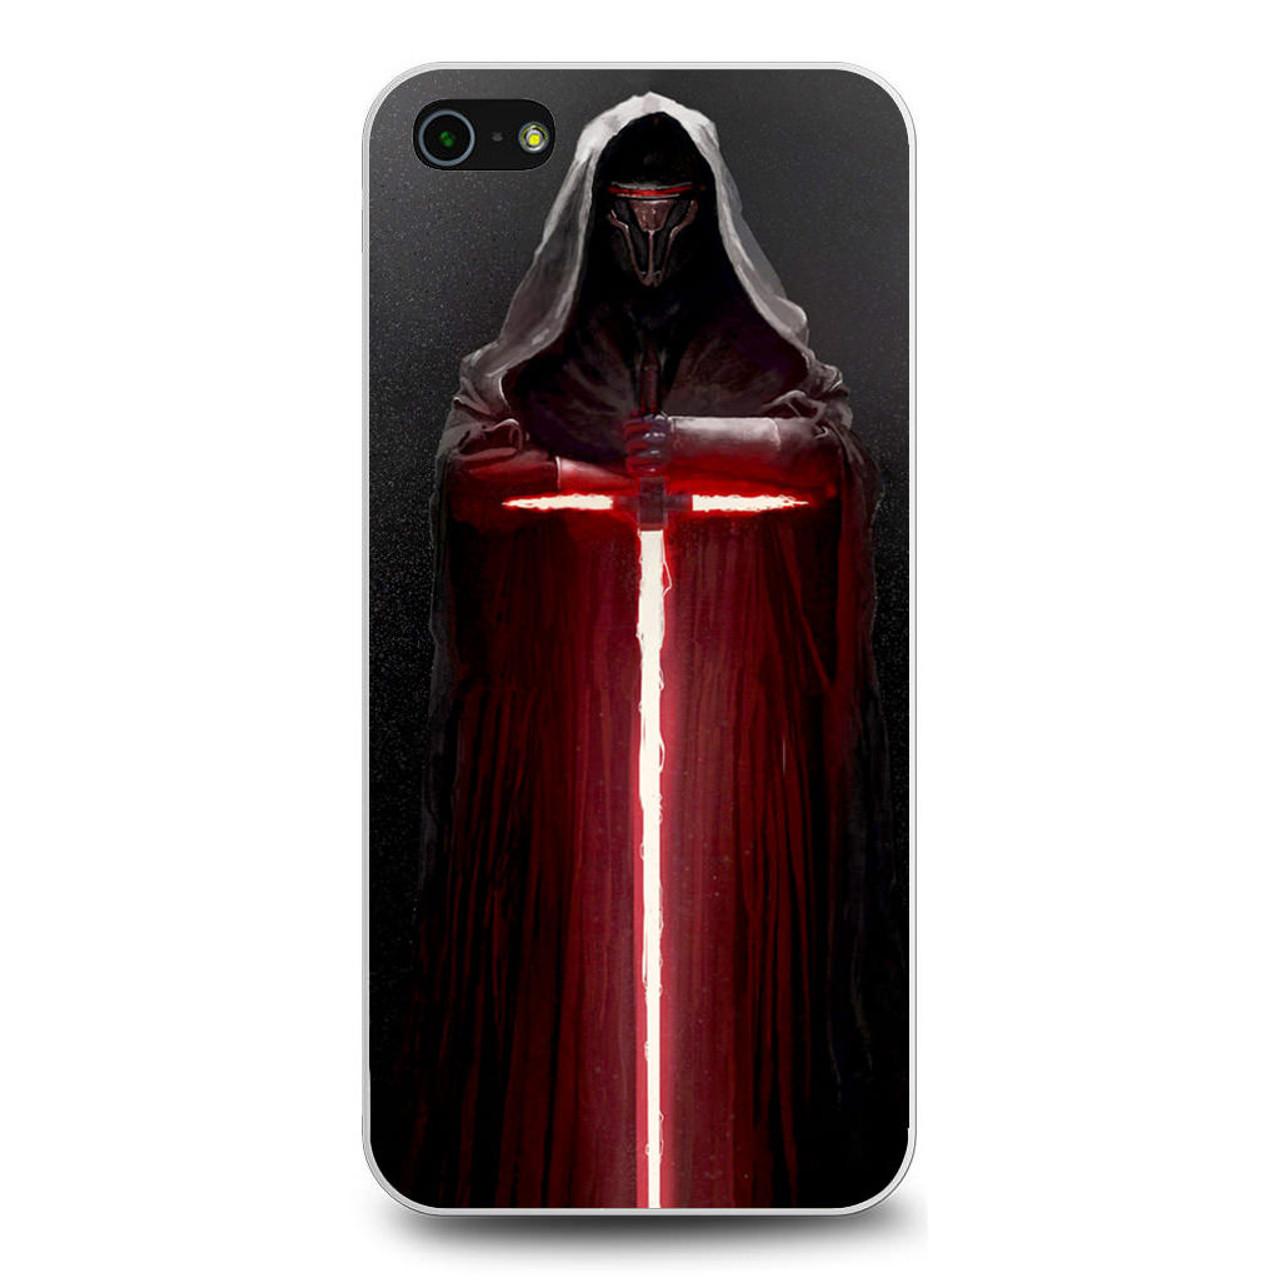 Kylo Ren Lightsaber Star Wars iPhone 5/5S/SE Case